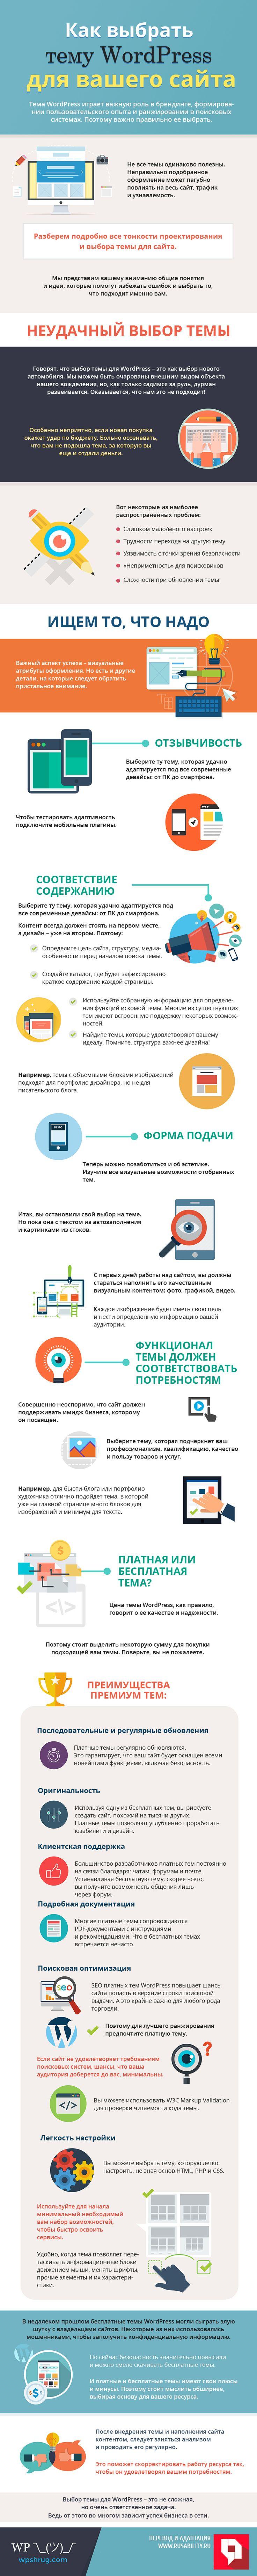 WordPress, тема, theme, блог, сайт, создание, юзабилити, разработка, CMS, маркетинг, инфографика